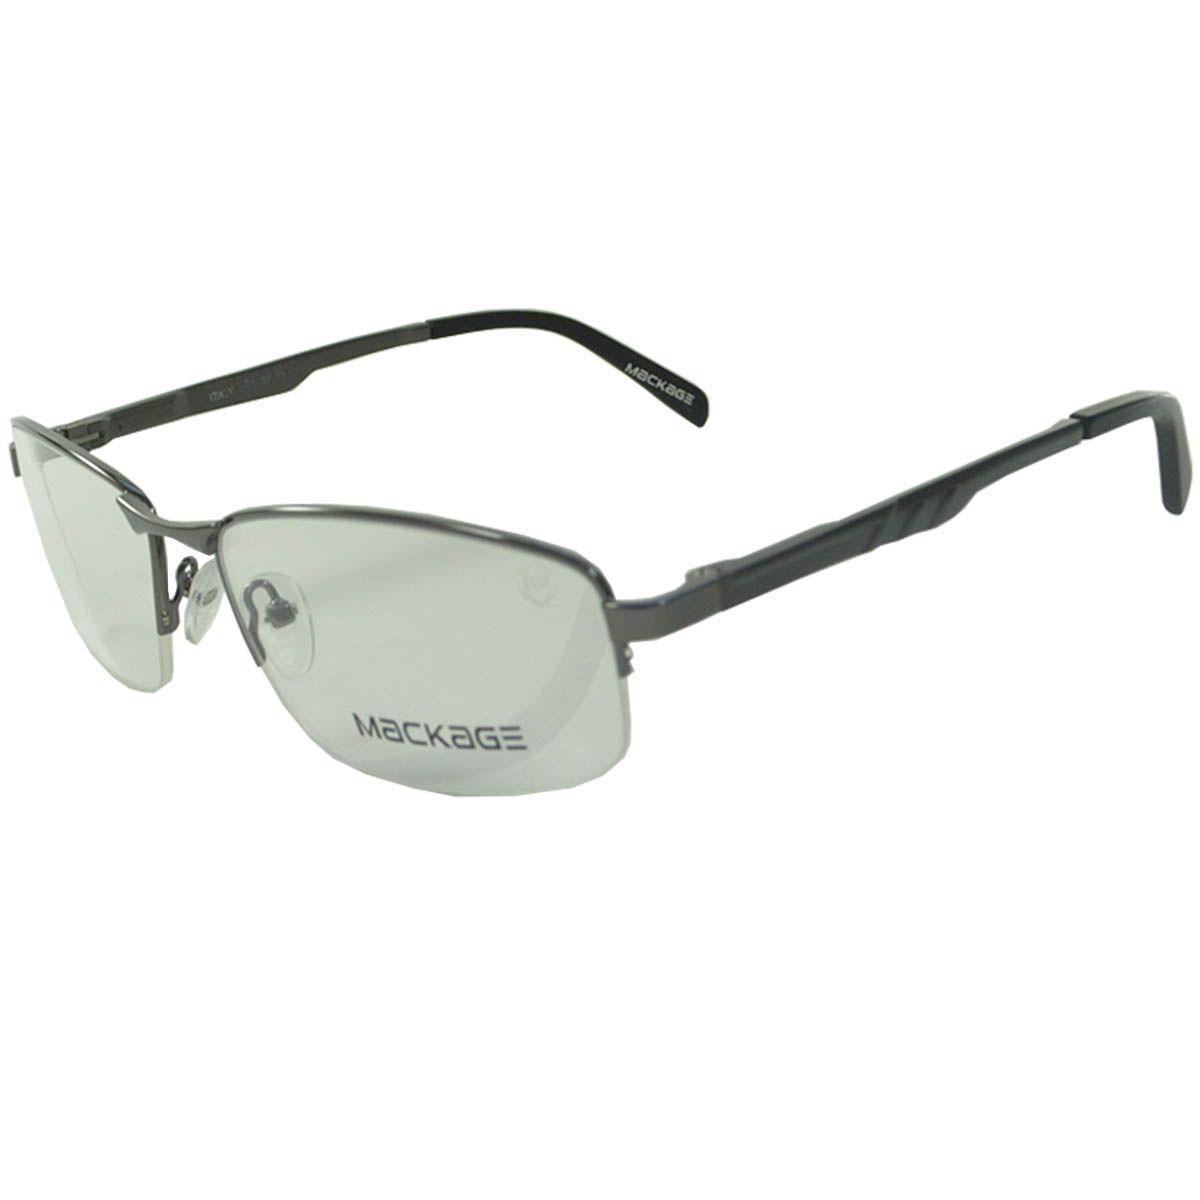 0694b4ceaa835 Óculos Mackage Armação MKA4035C2 Preto Lilás